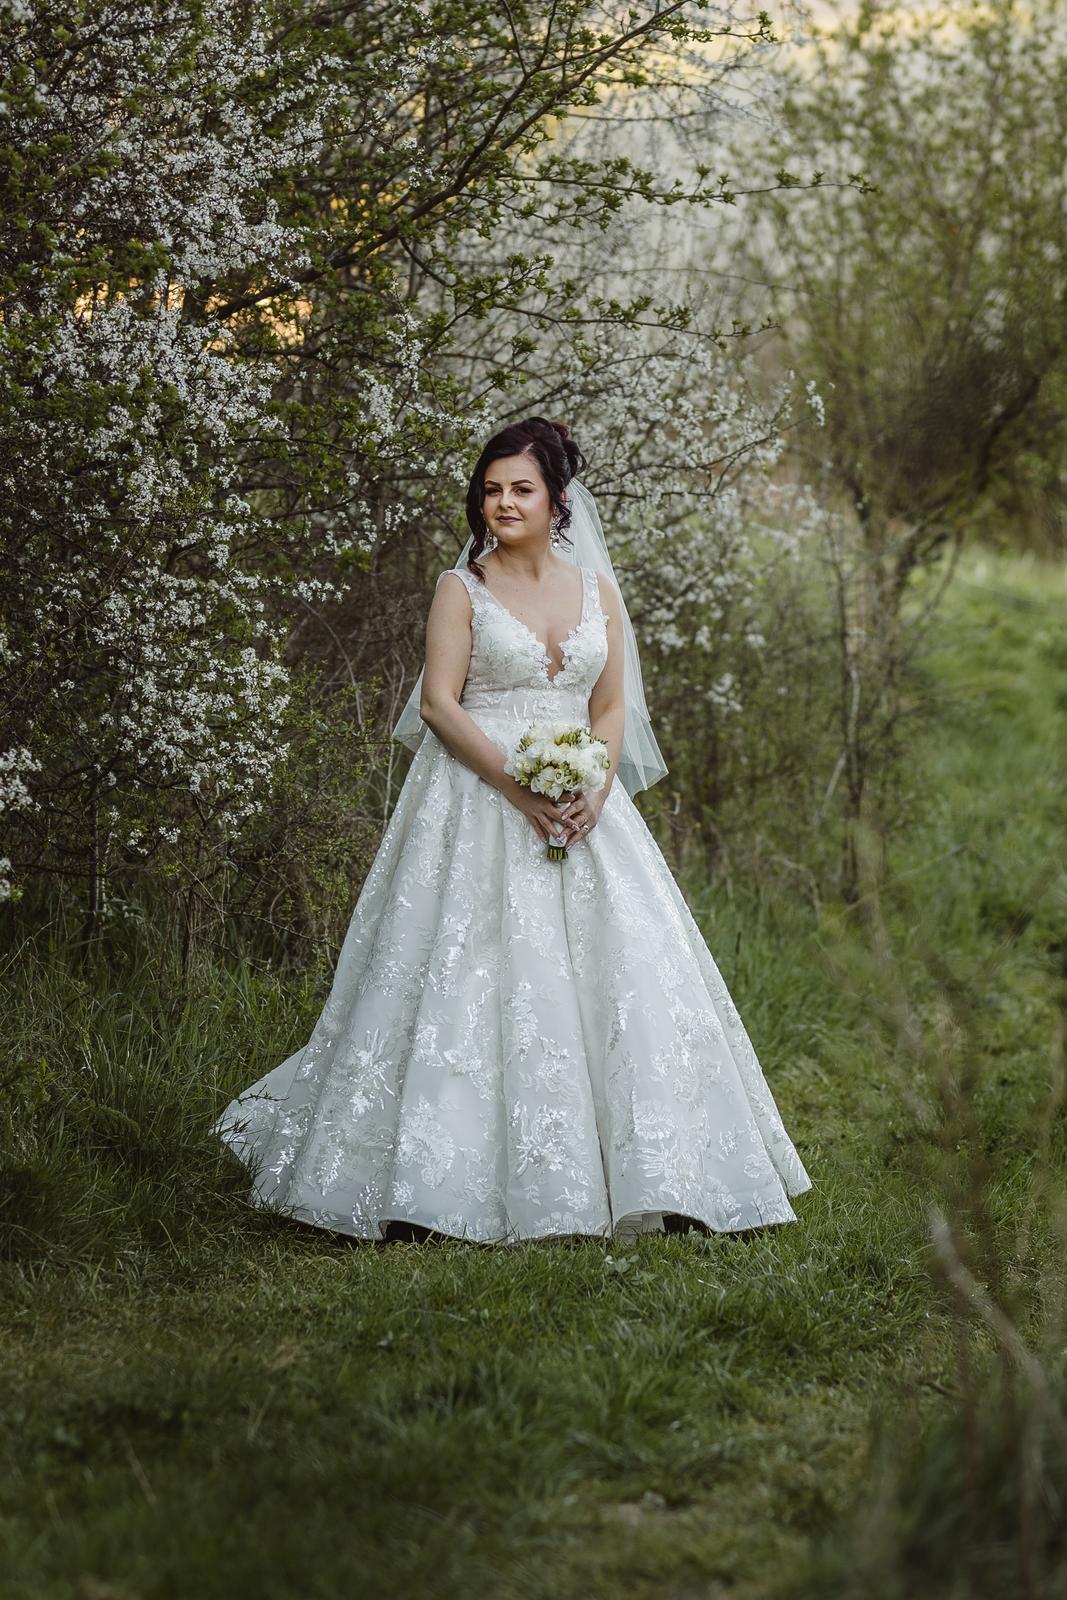 Svadobné šaty iwory - Obrázok č. 1